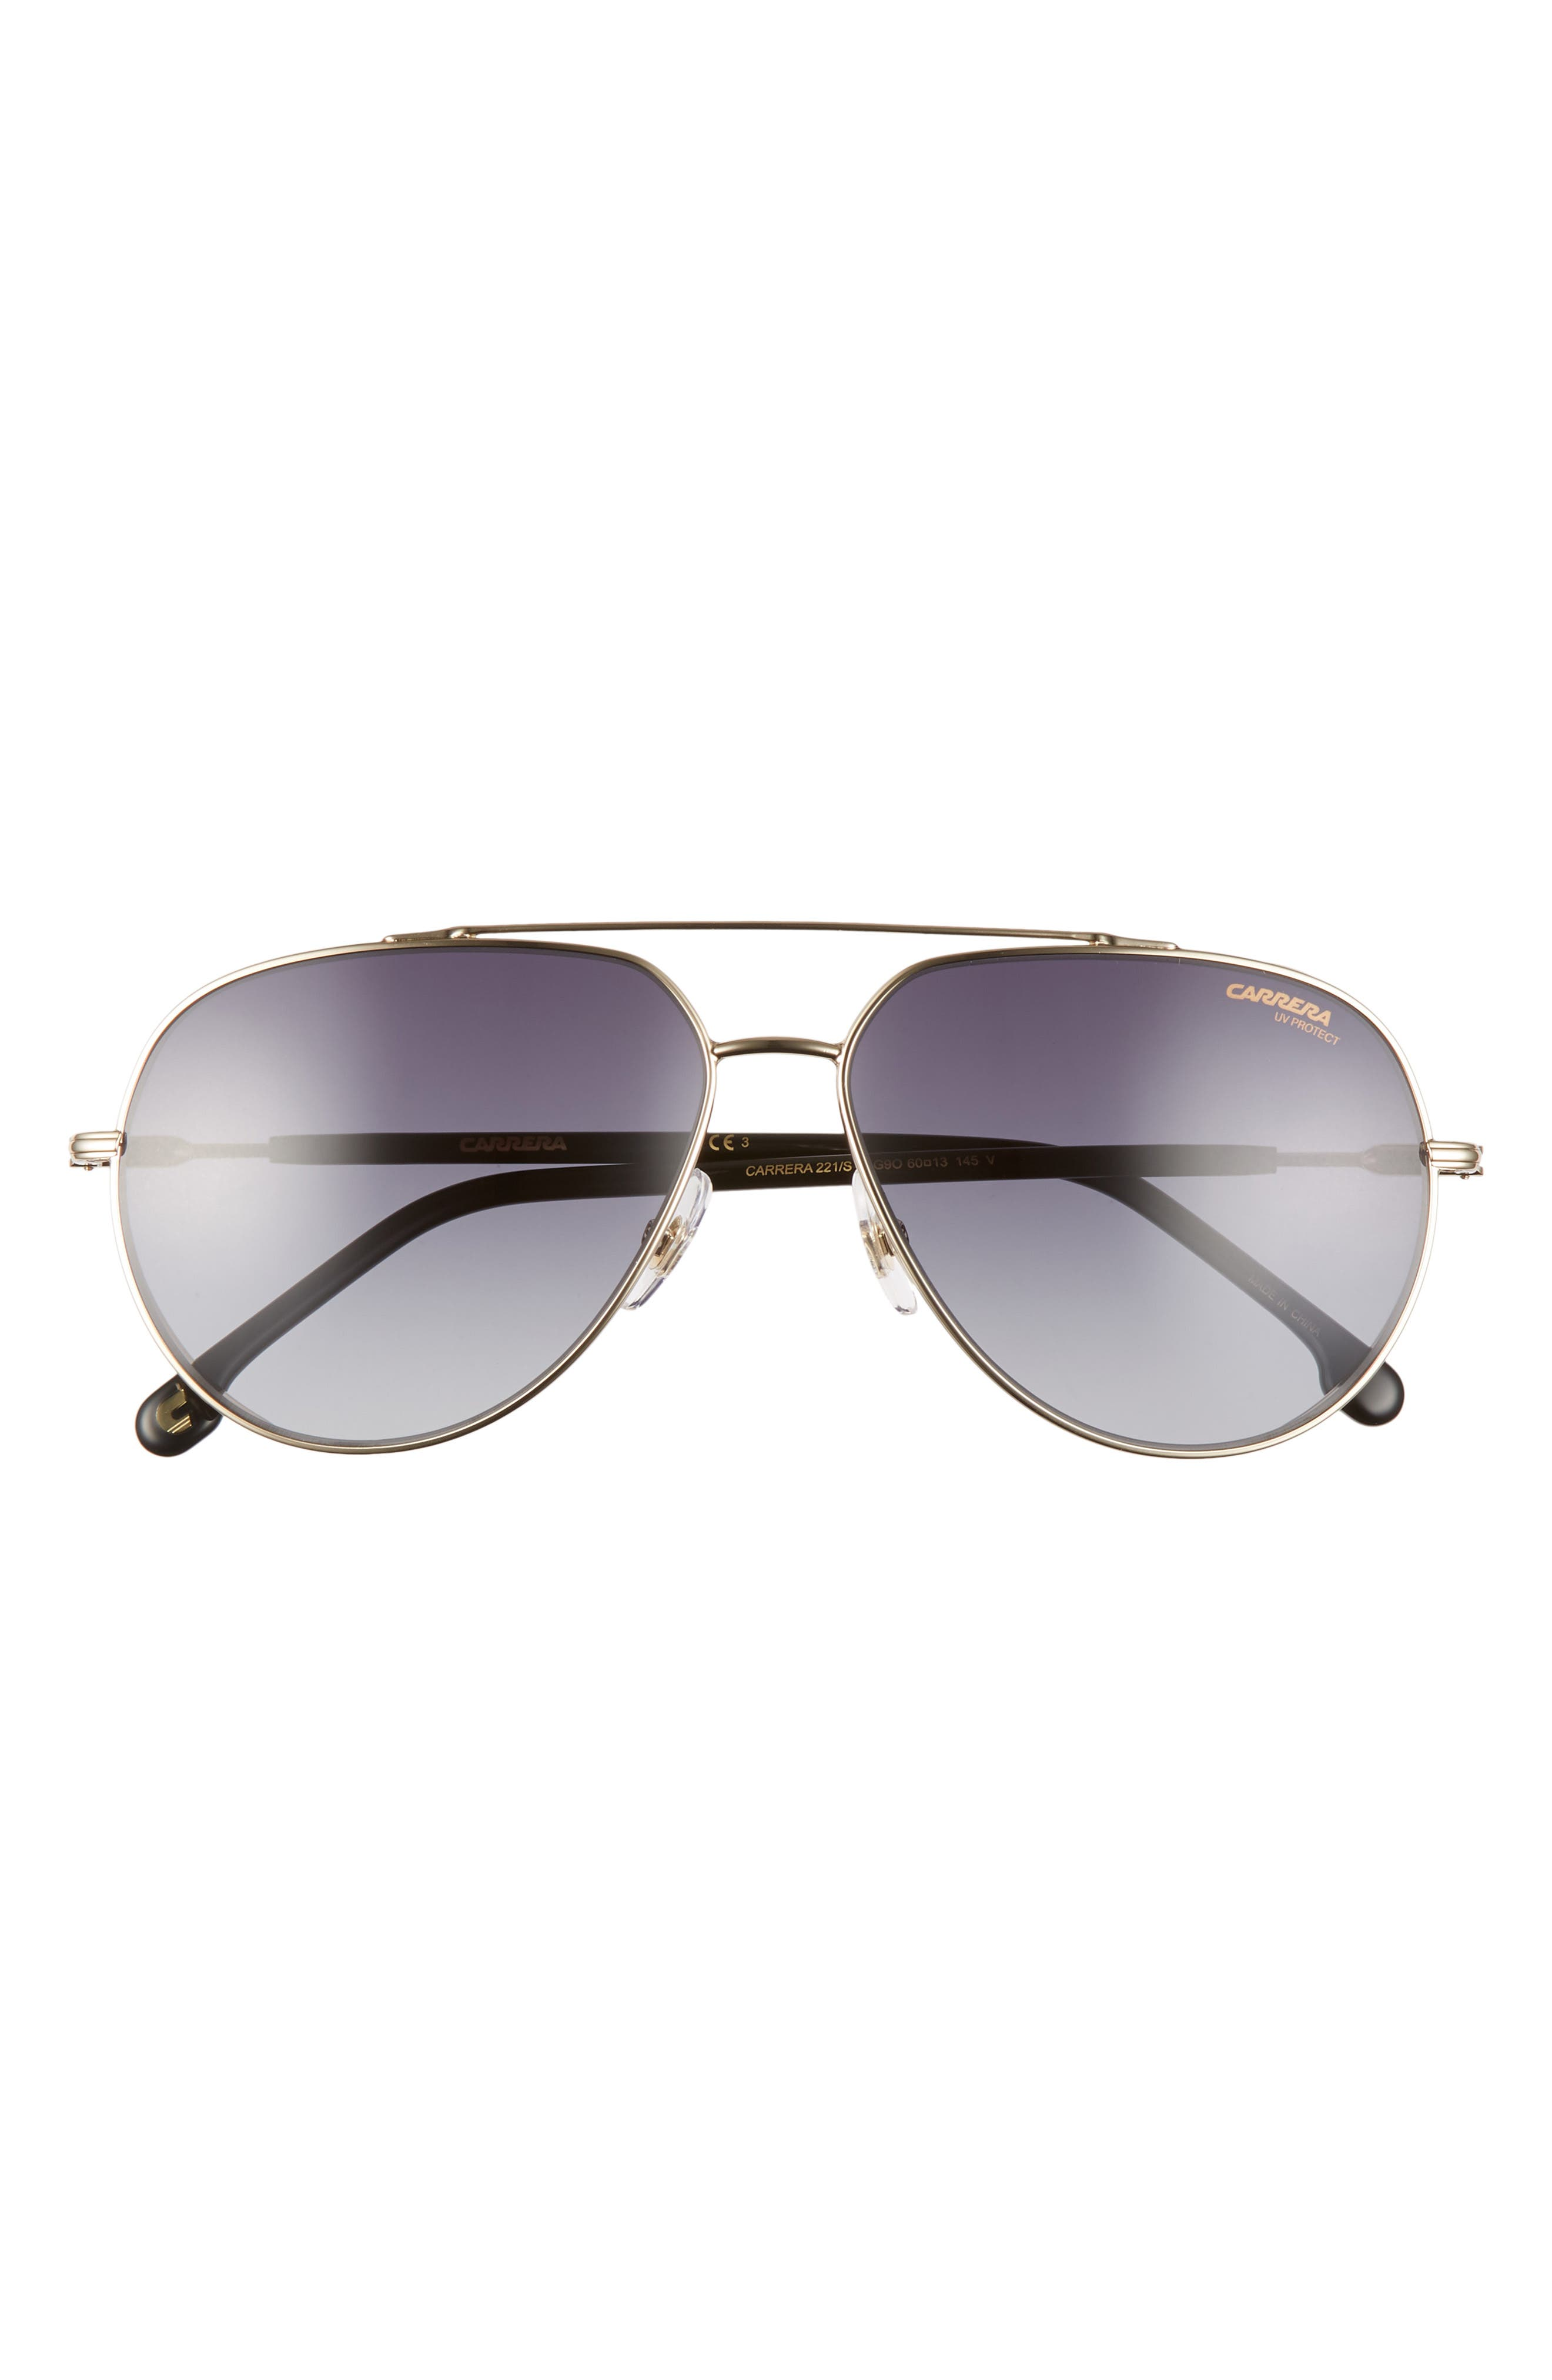 Image of Carrera Eyewear 60mm Polarized Aviator Sunglasses